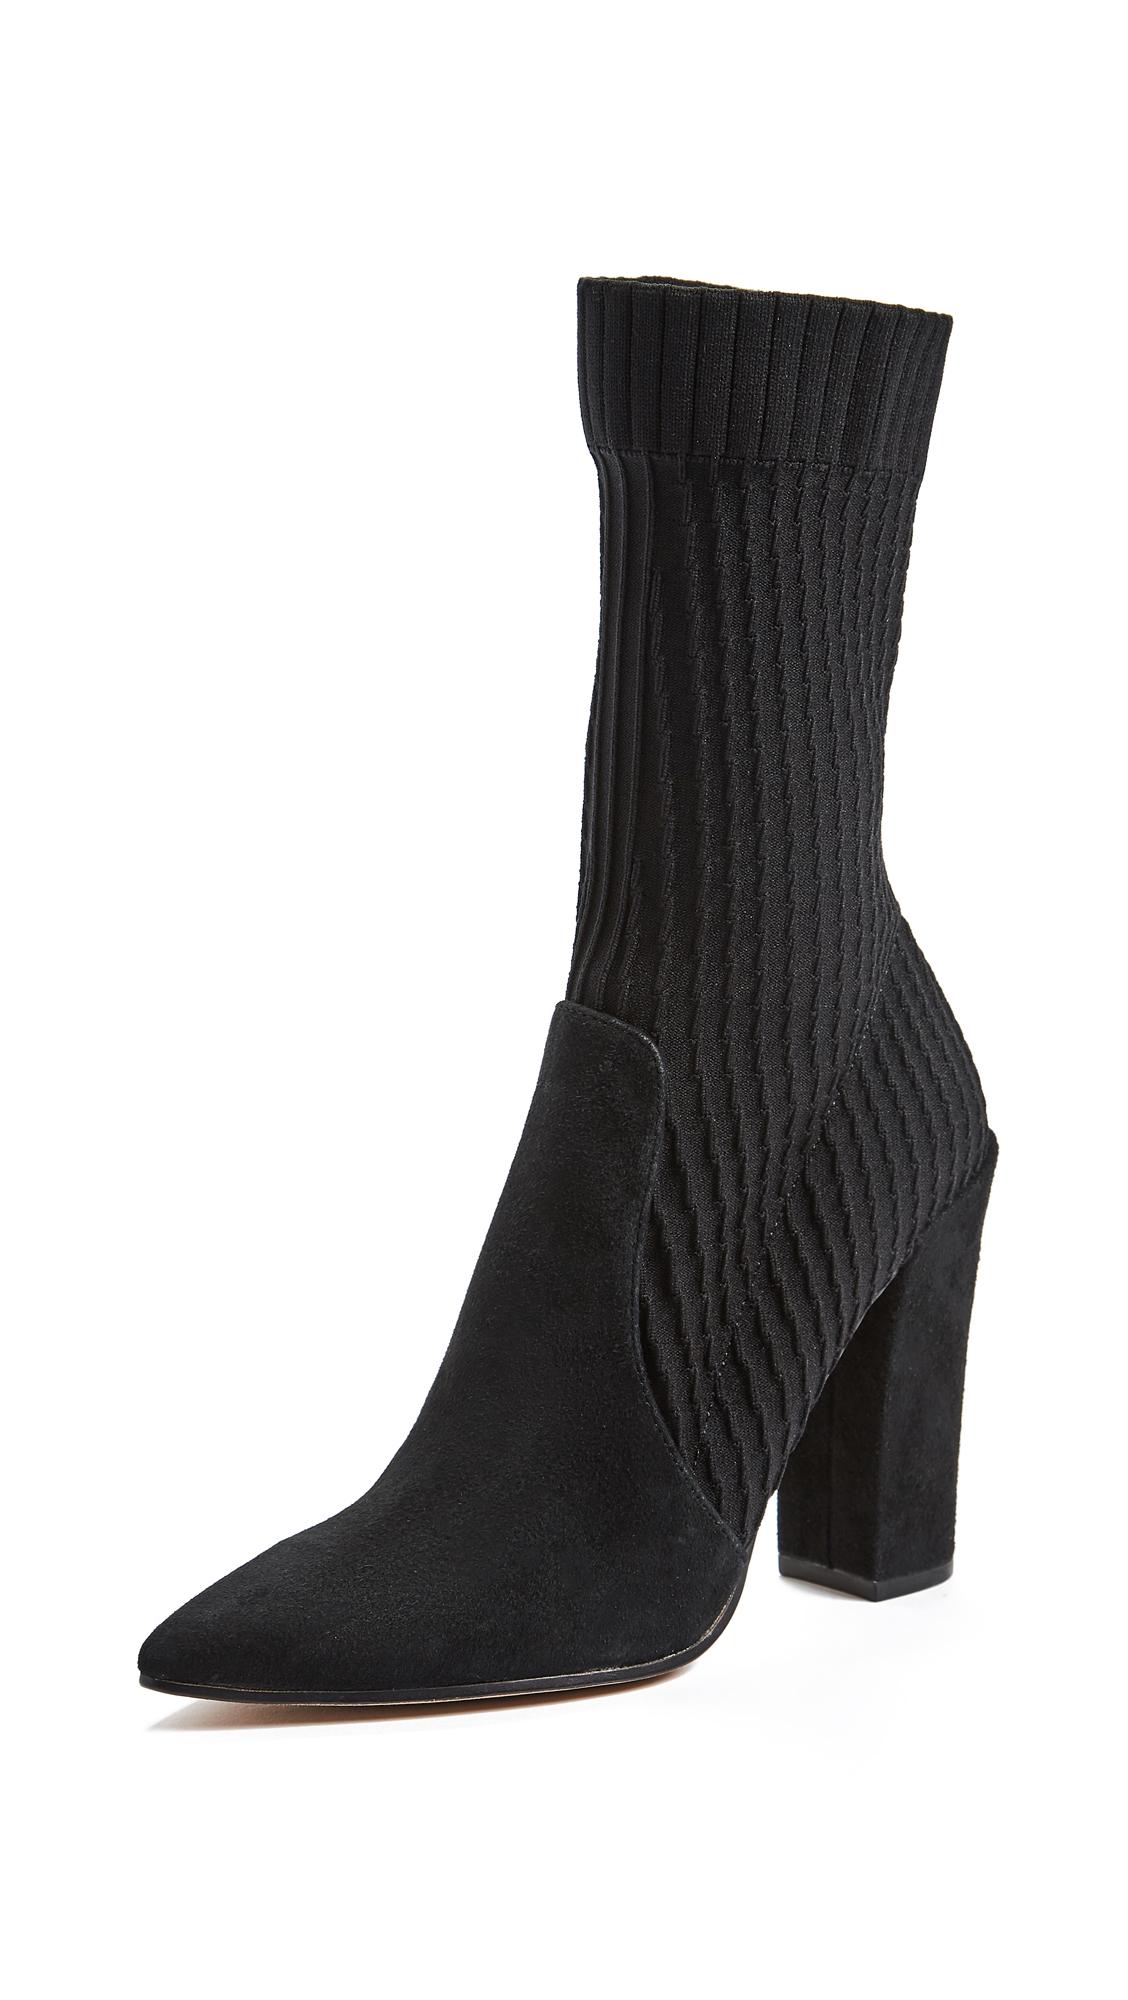 Dolce Vita Elon Sock Boots - Black